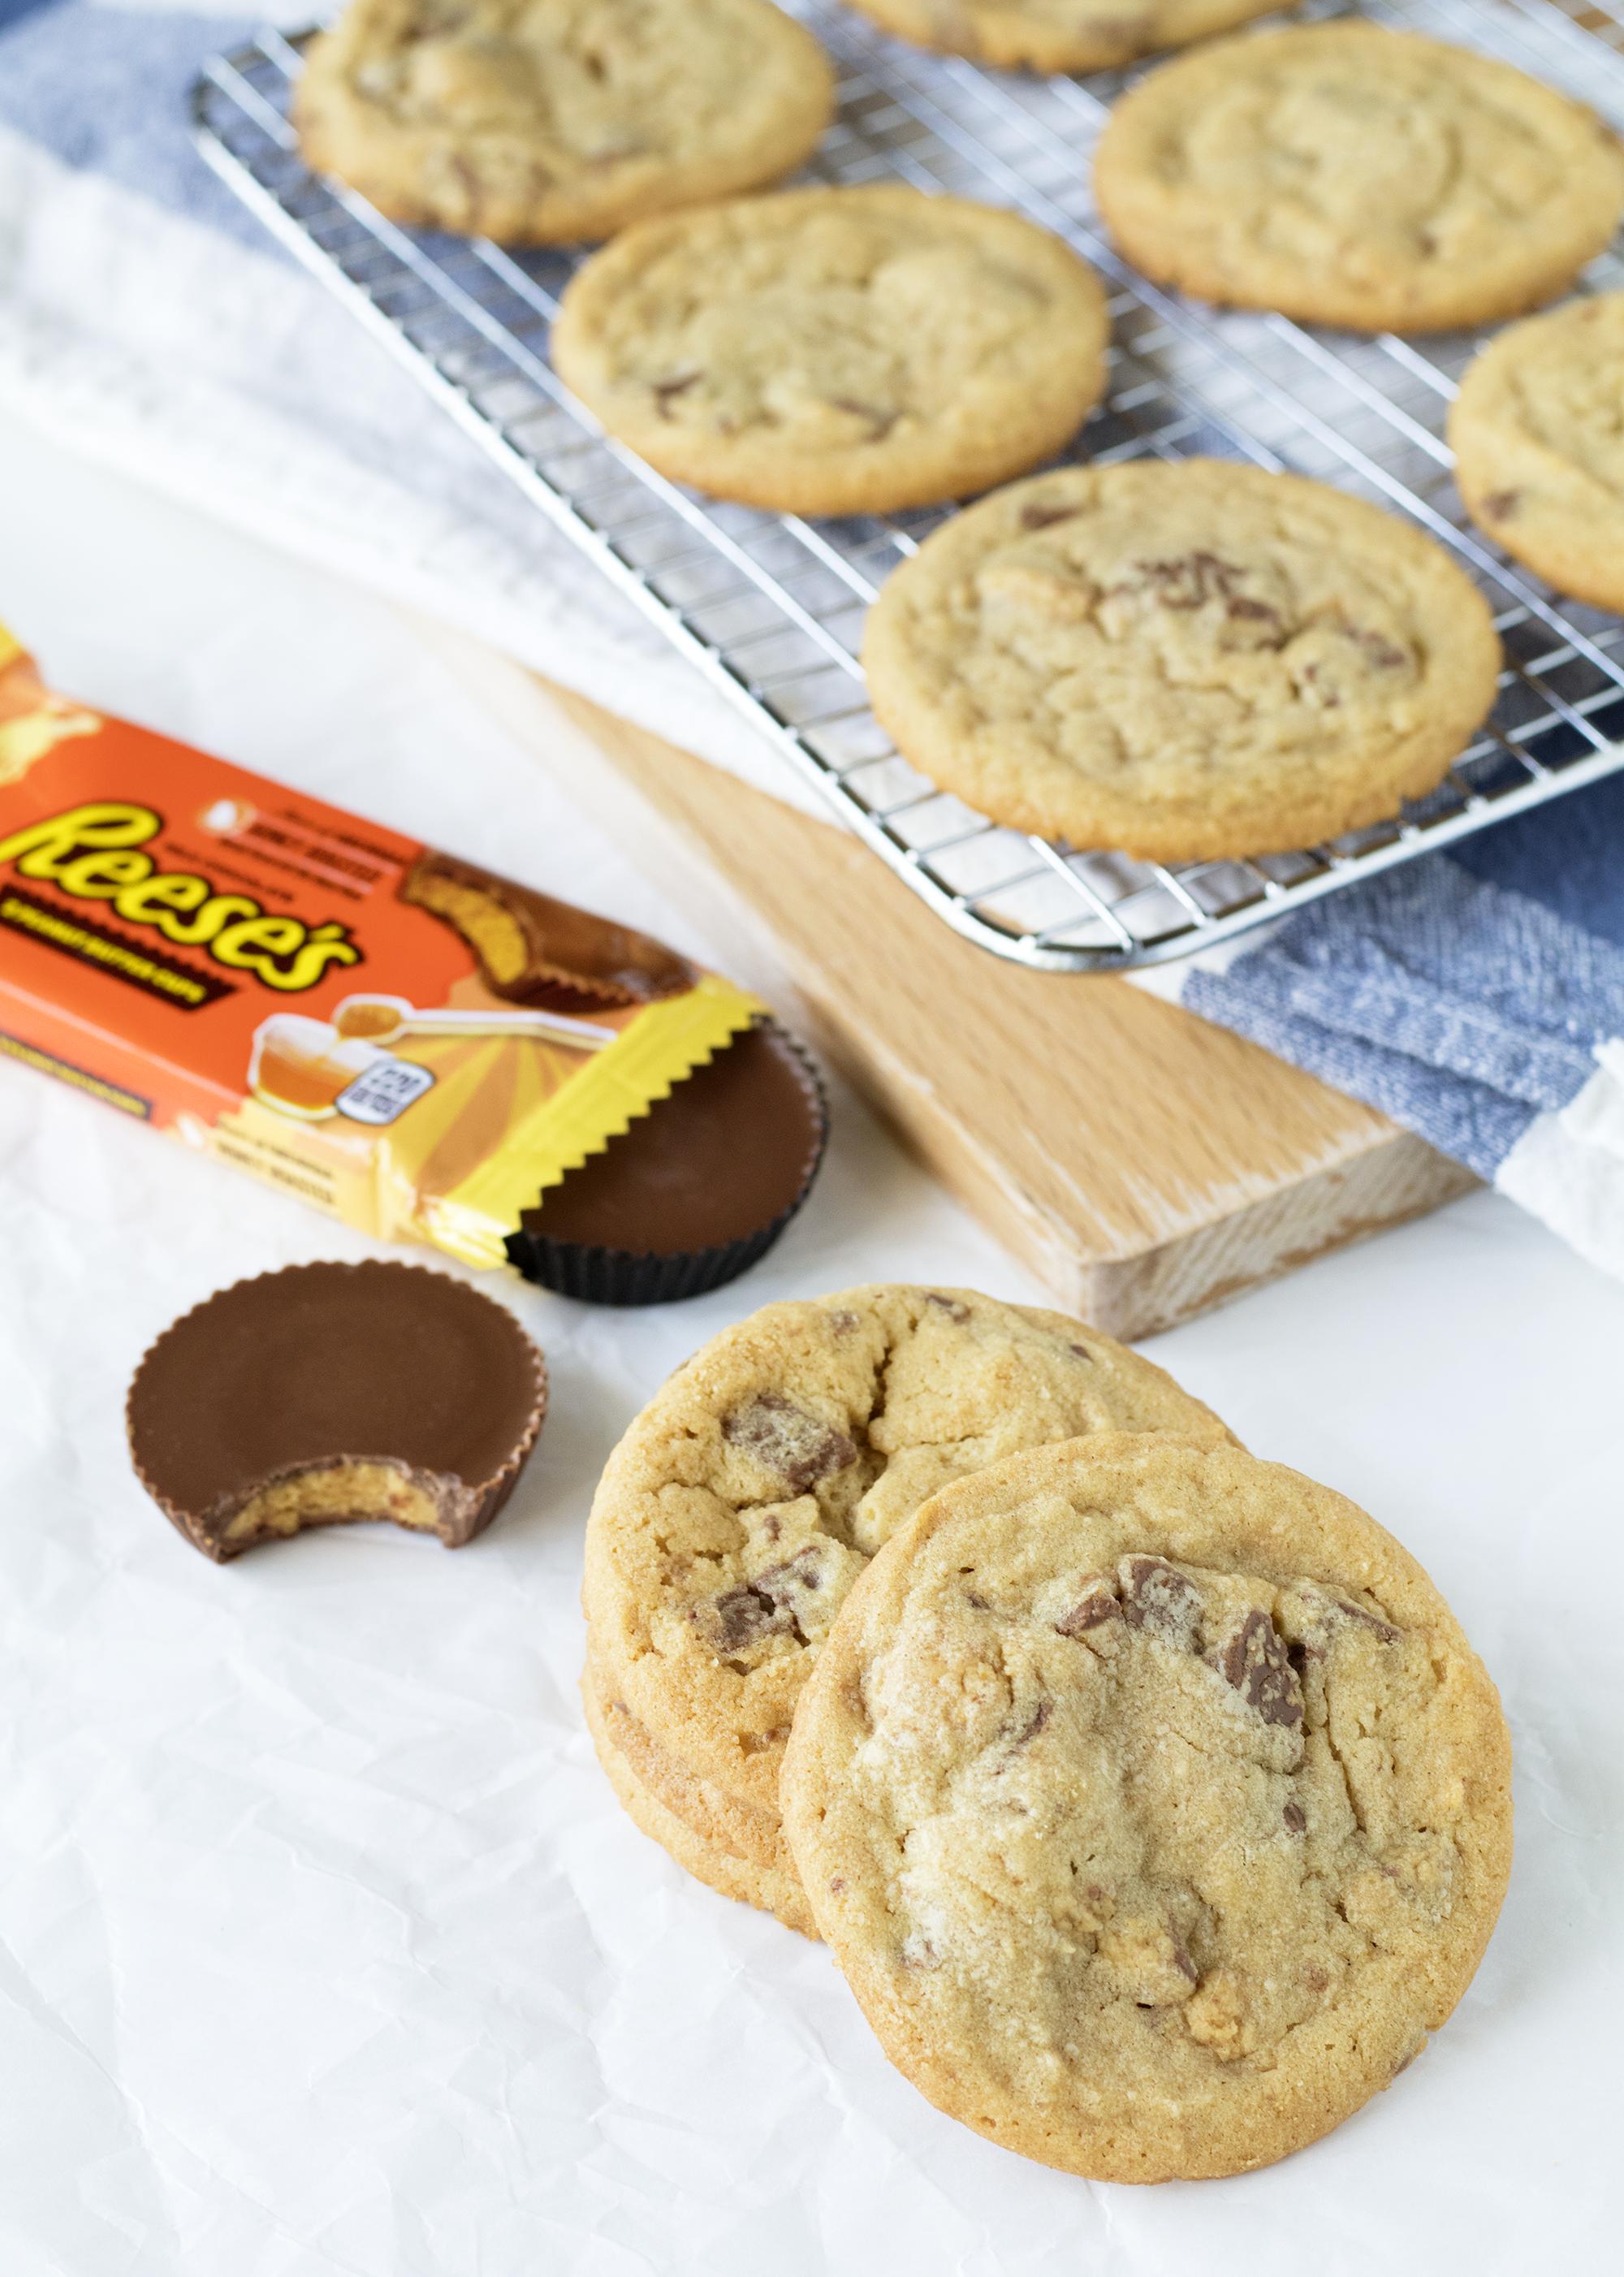 Honey Roasted Reese's Peanut Butter Cookies   Sarah Makes Stuff